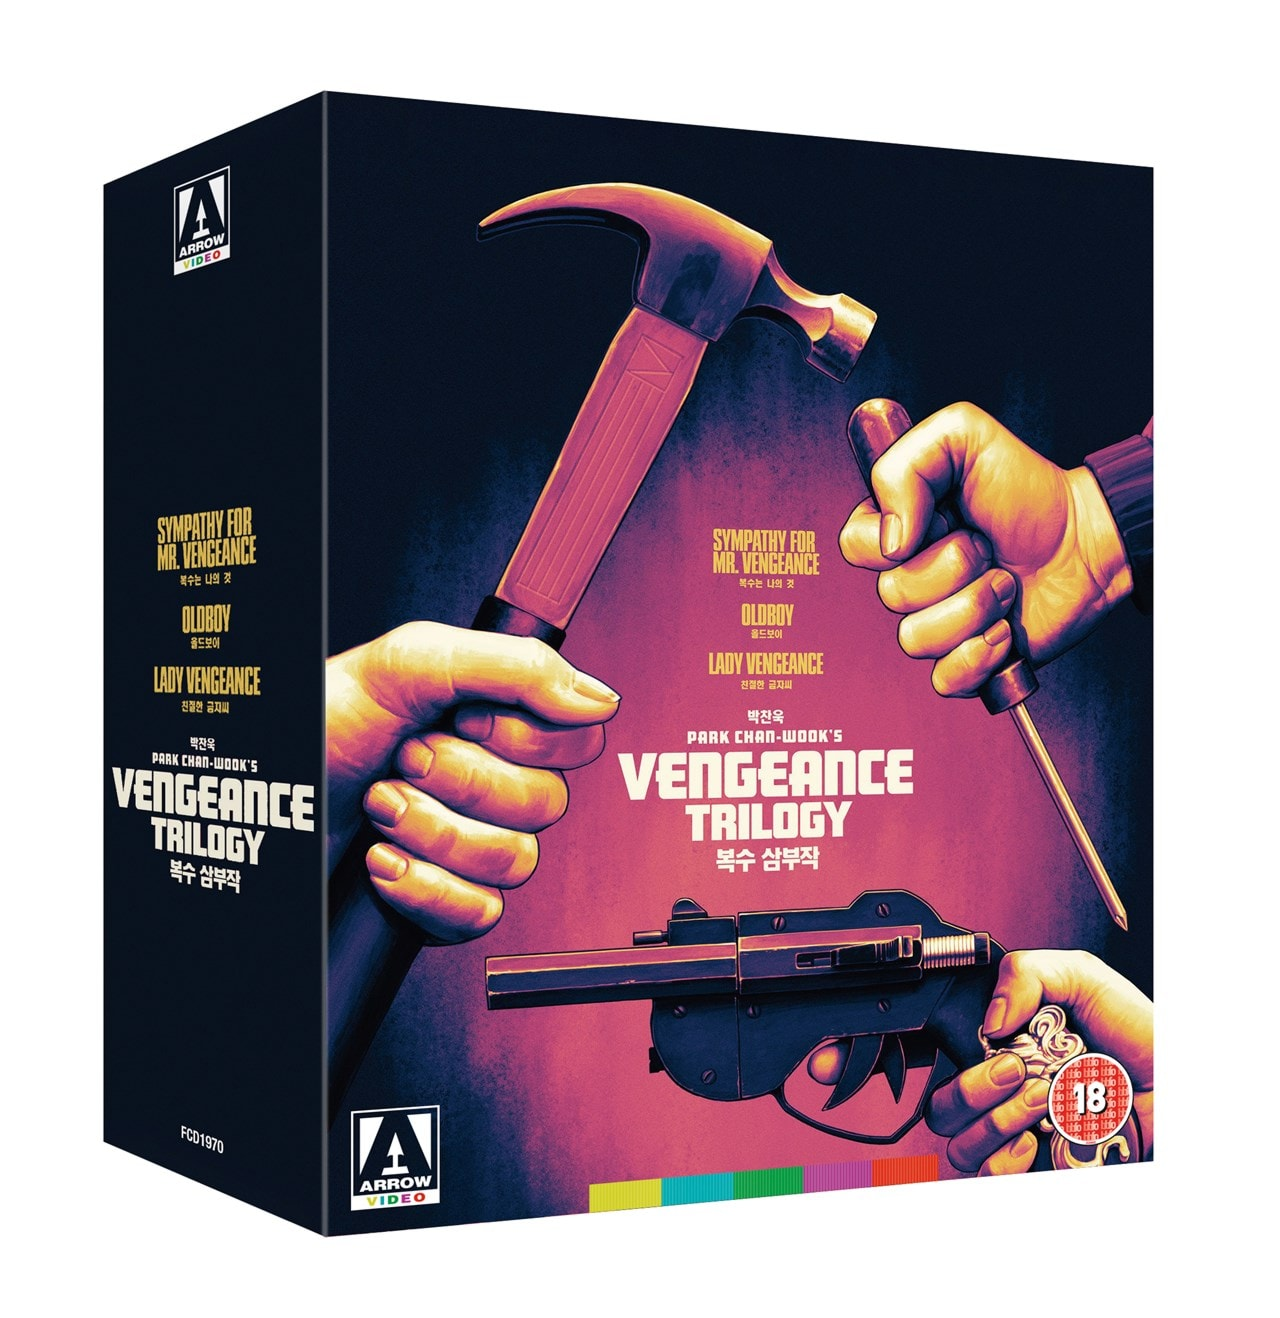 The Vengeance Trilogy - 3